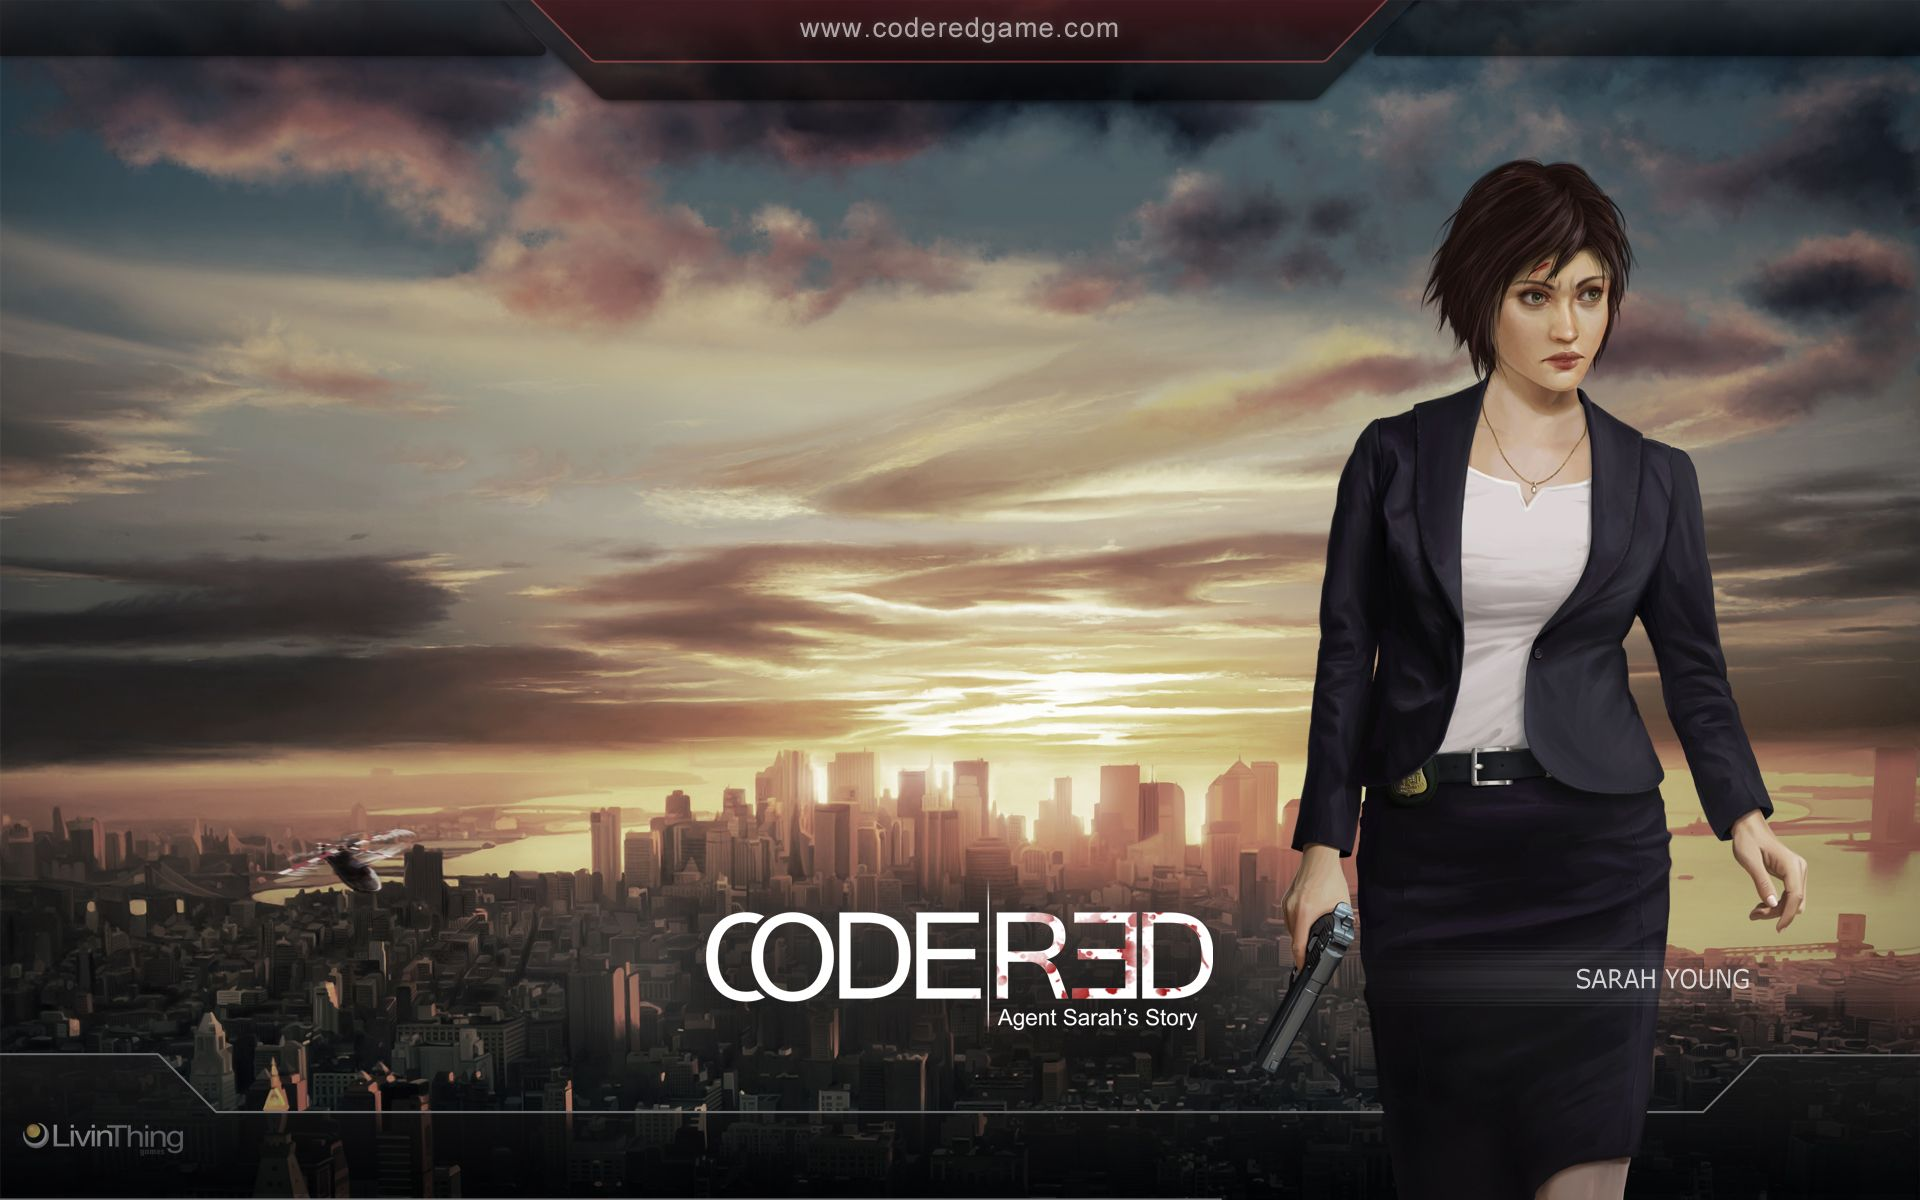 CodeRed: Agent Sarah's Story